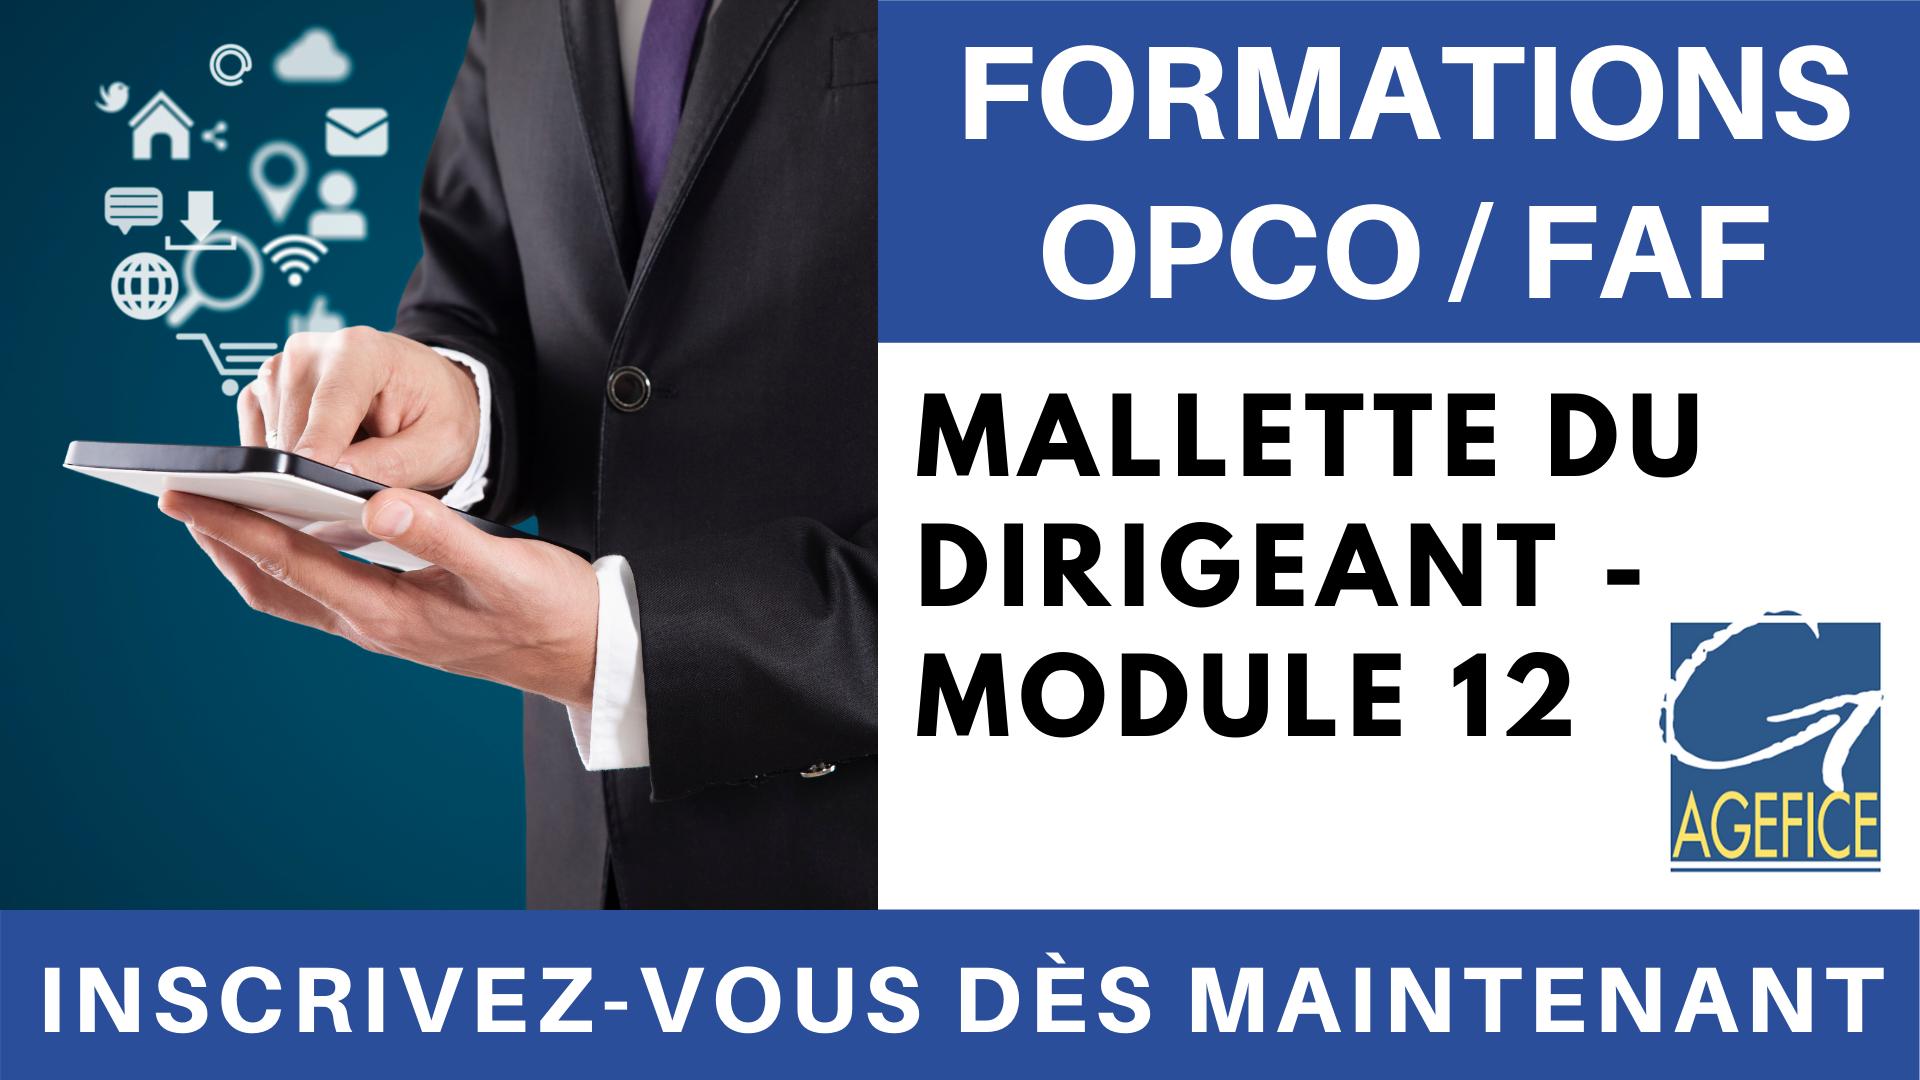 Vidéo - Formation OPCO_FAF Mallette du dirigeant mod 12